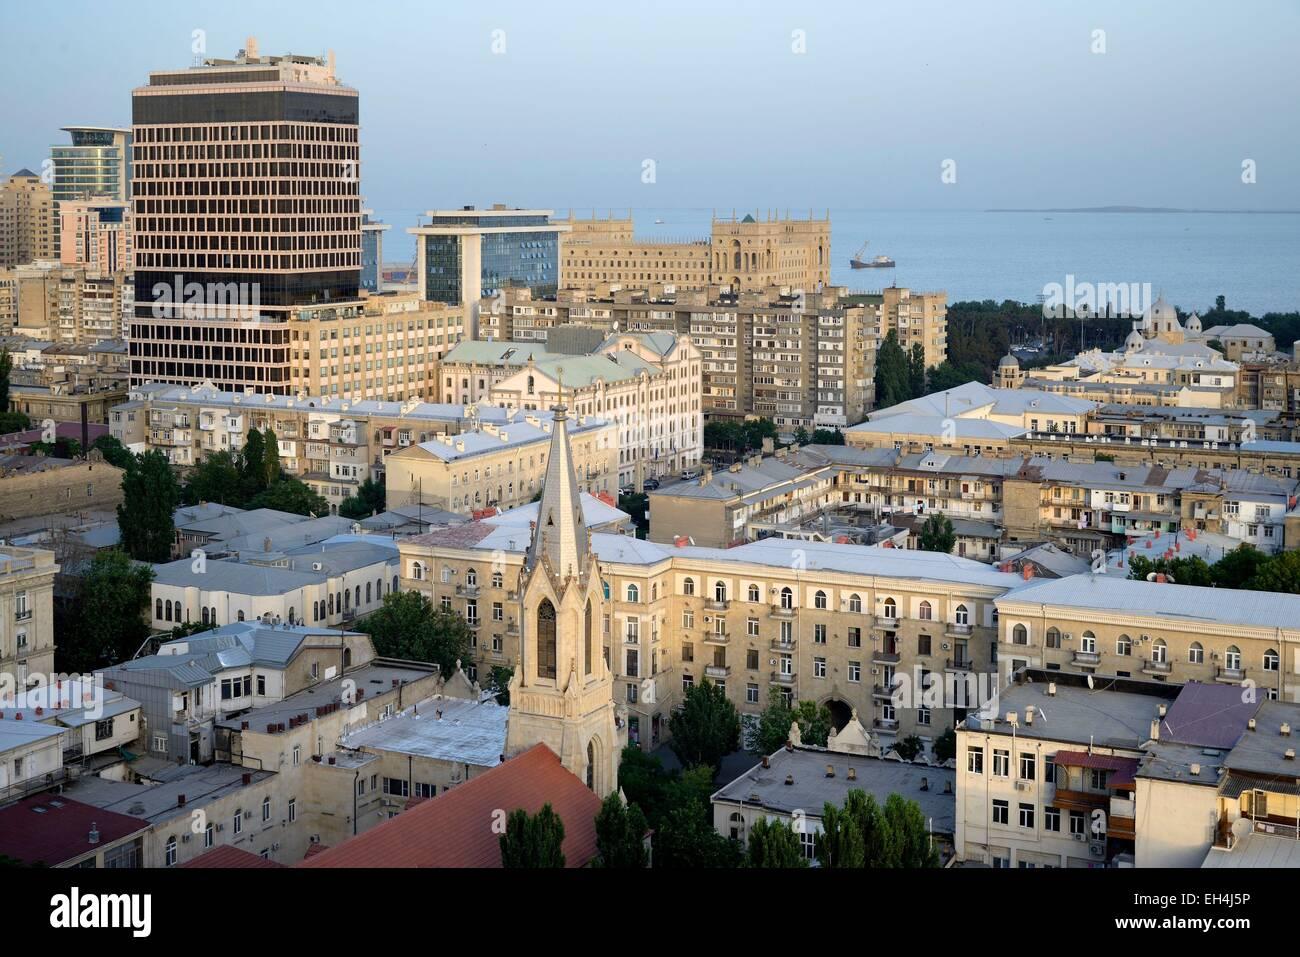 Azerbaijan, Baku, General view of the city and the Caspian sea - Stock Image